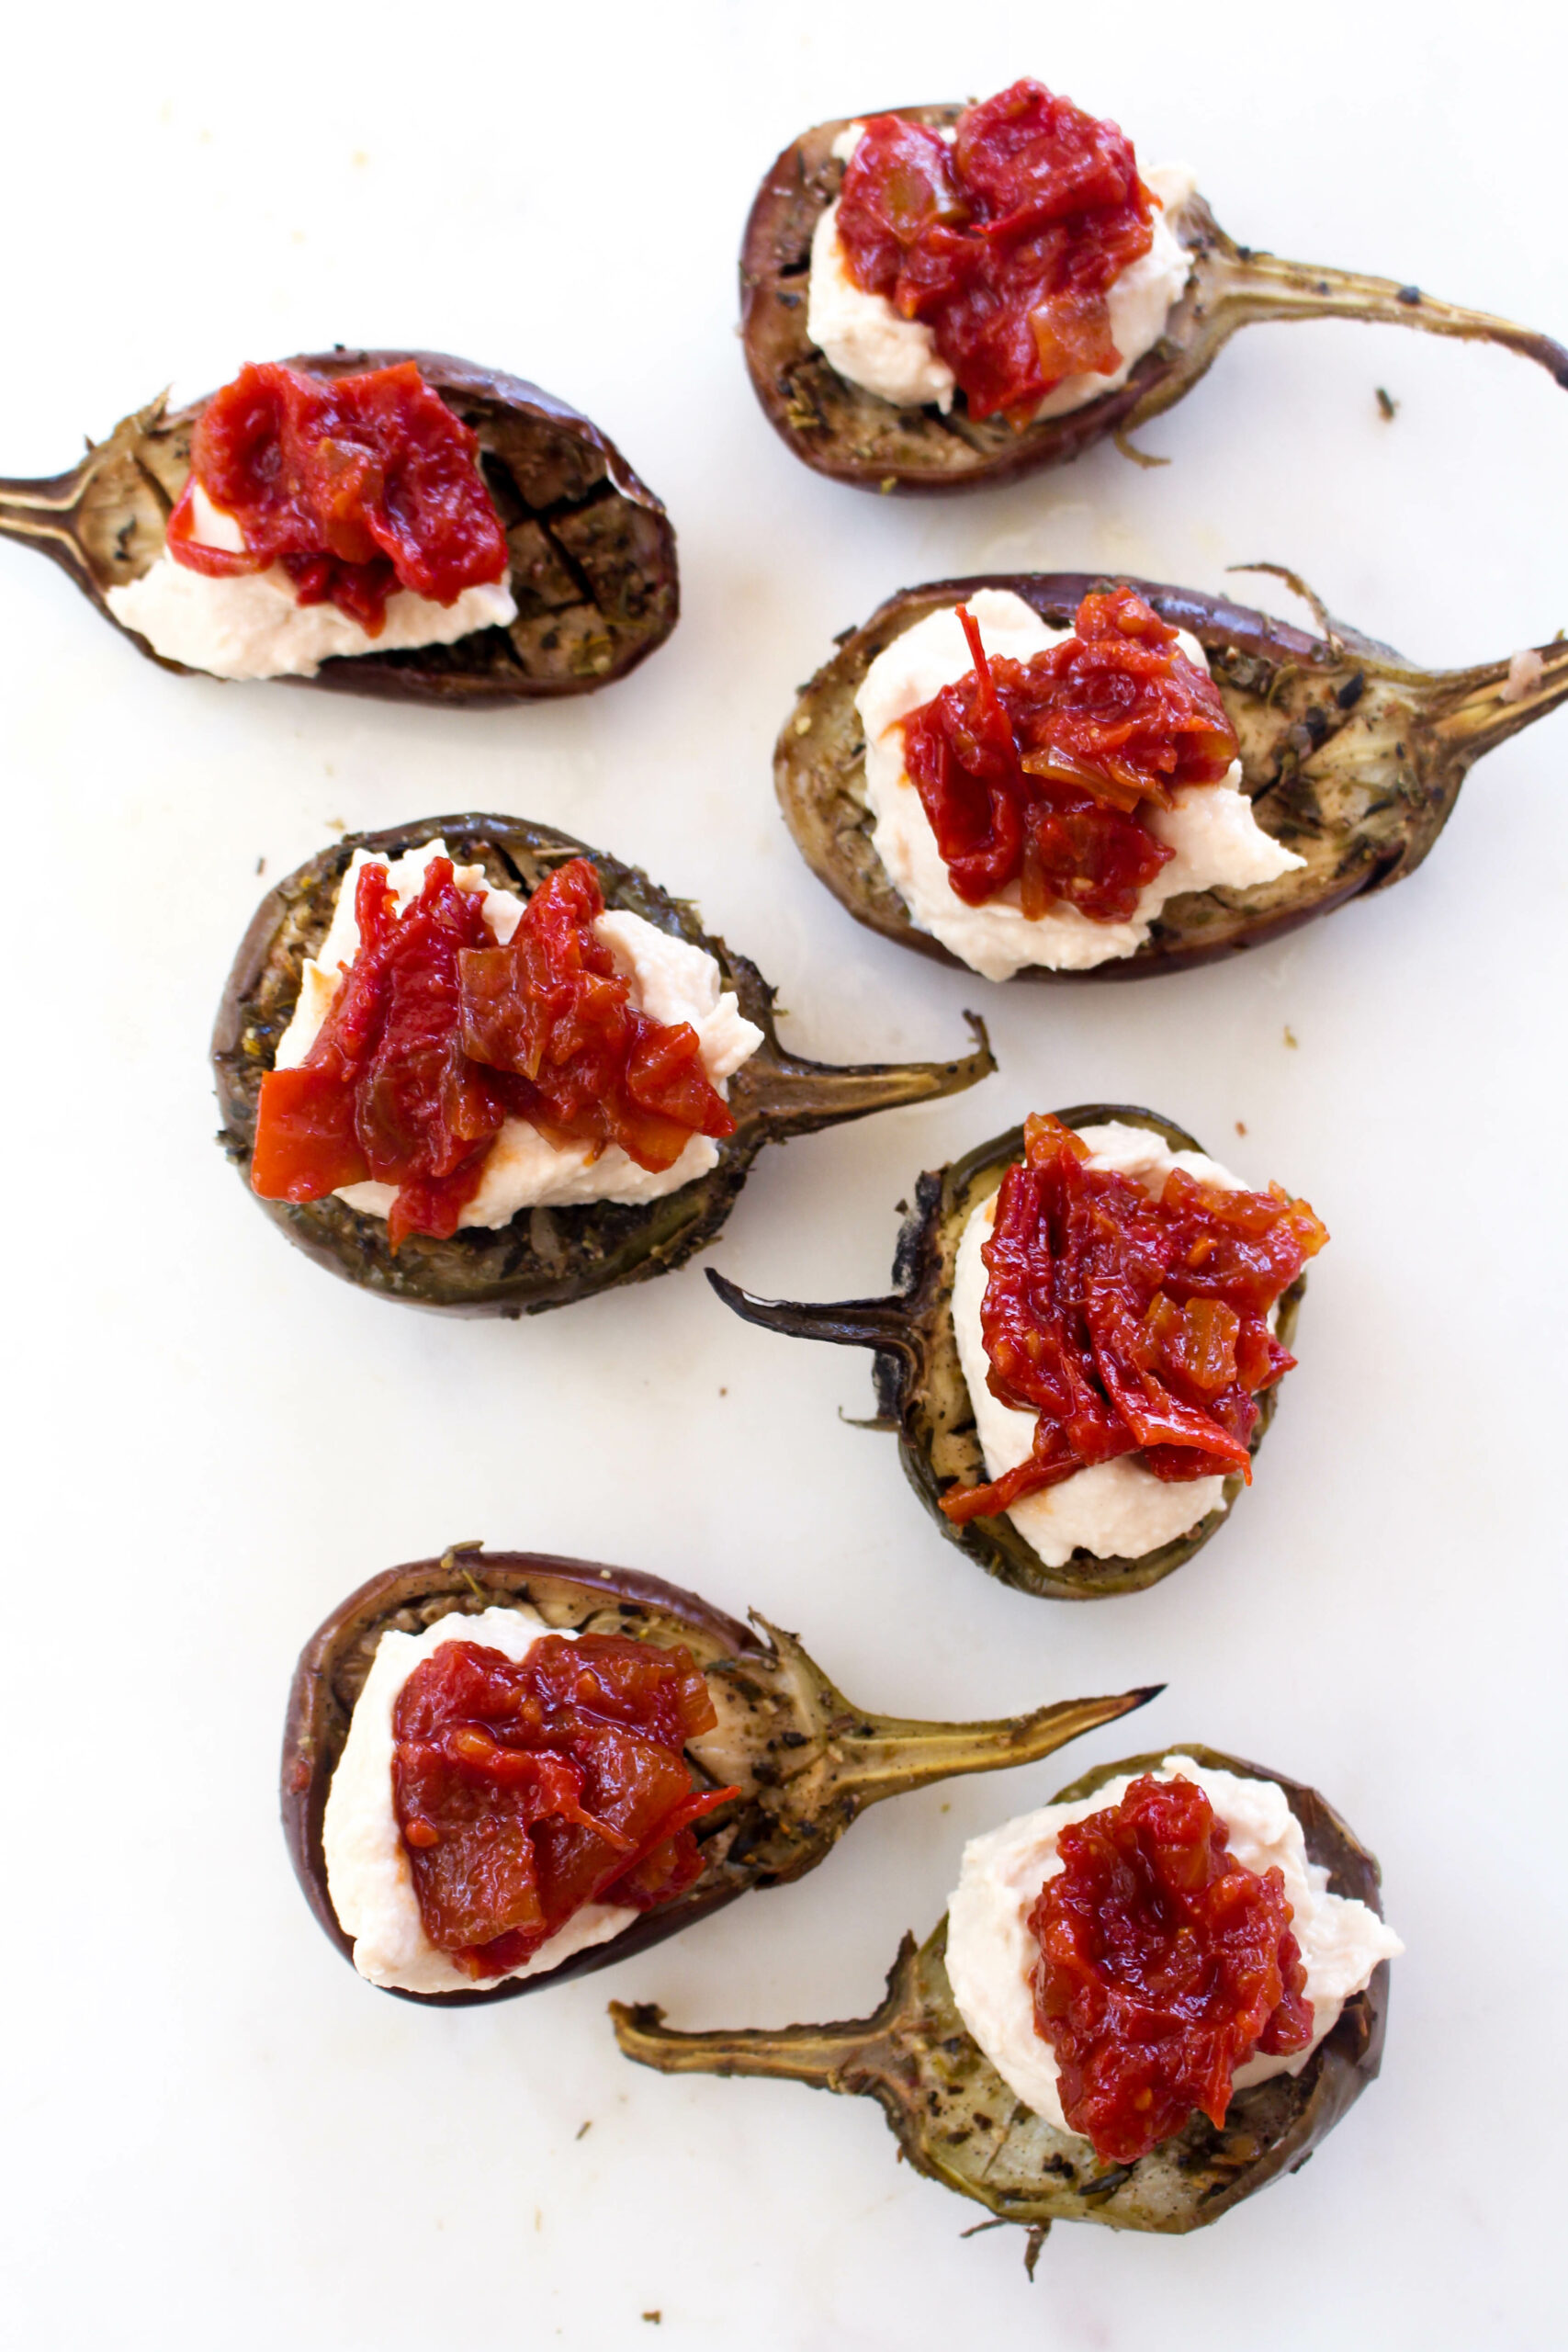 Slow roasted eggplant with hummus and tomato jam tomato jam